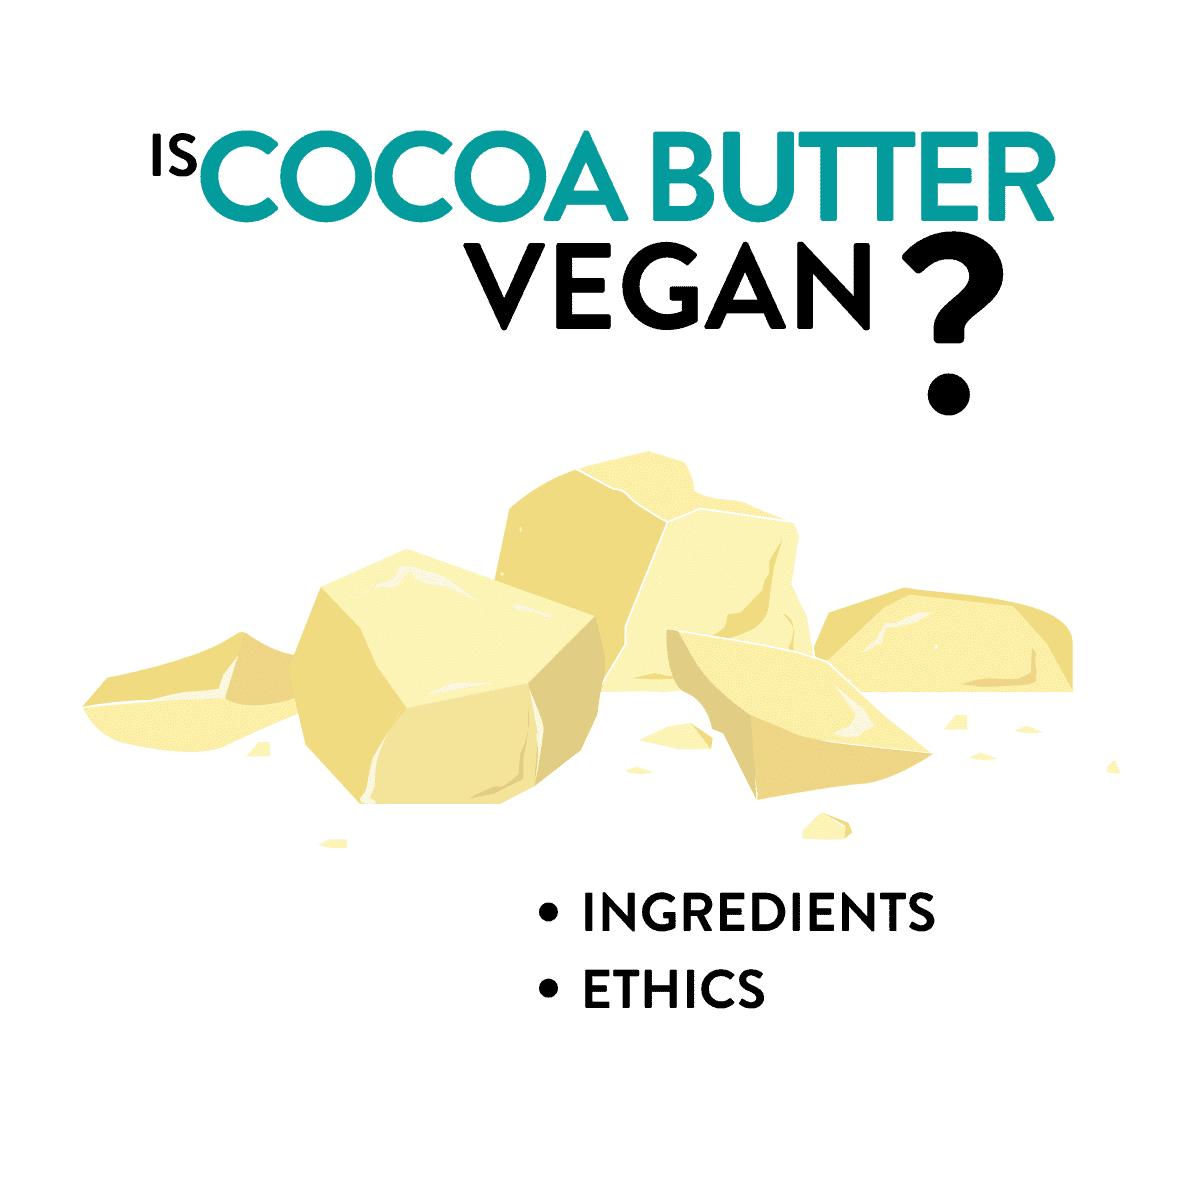 Is Cocoa Butter Vegan?